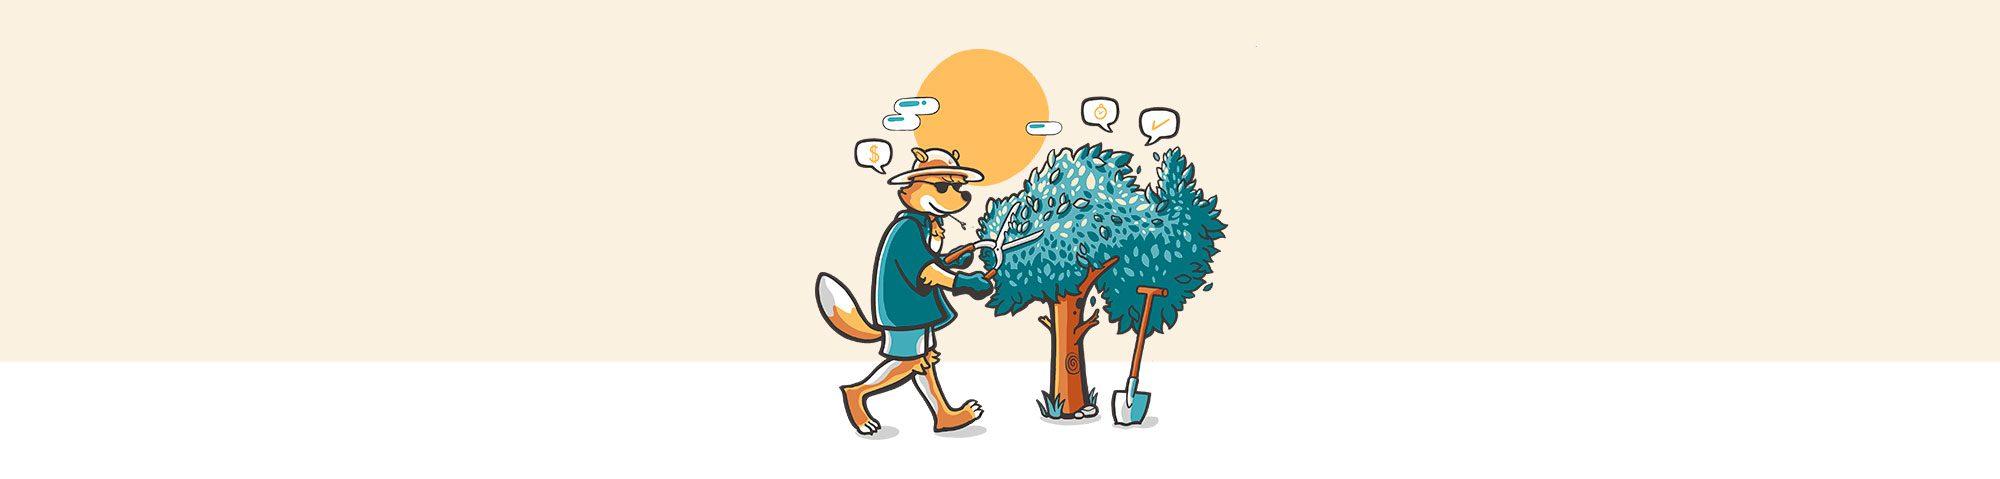 trabajar de jardinero en australia